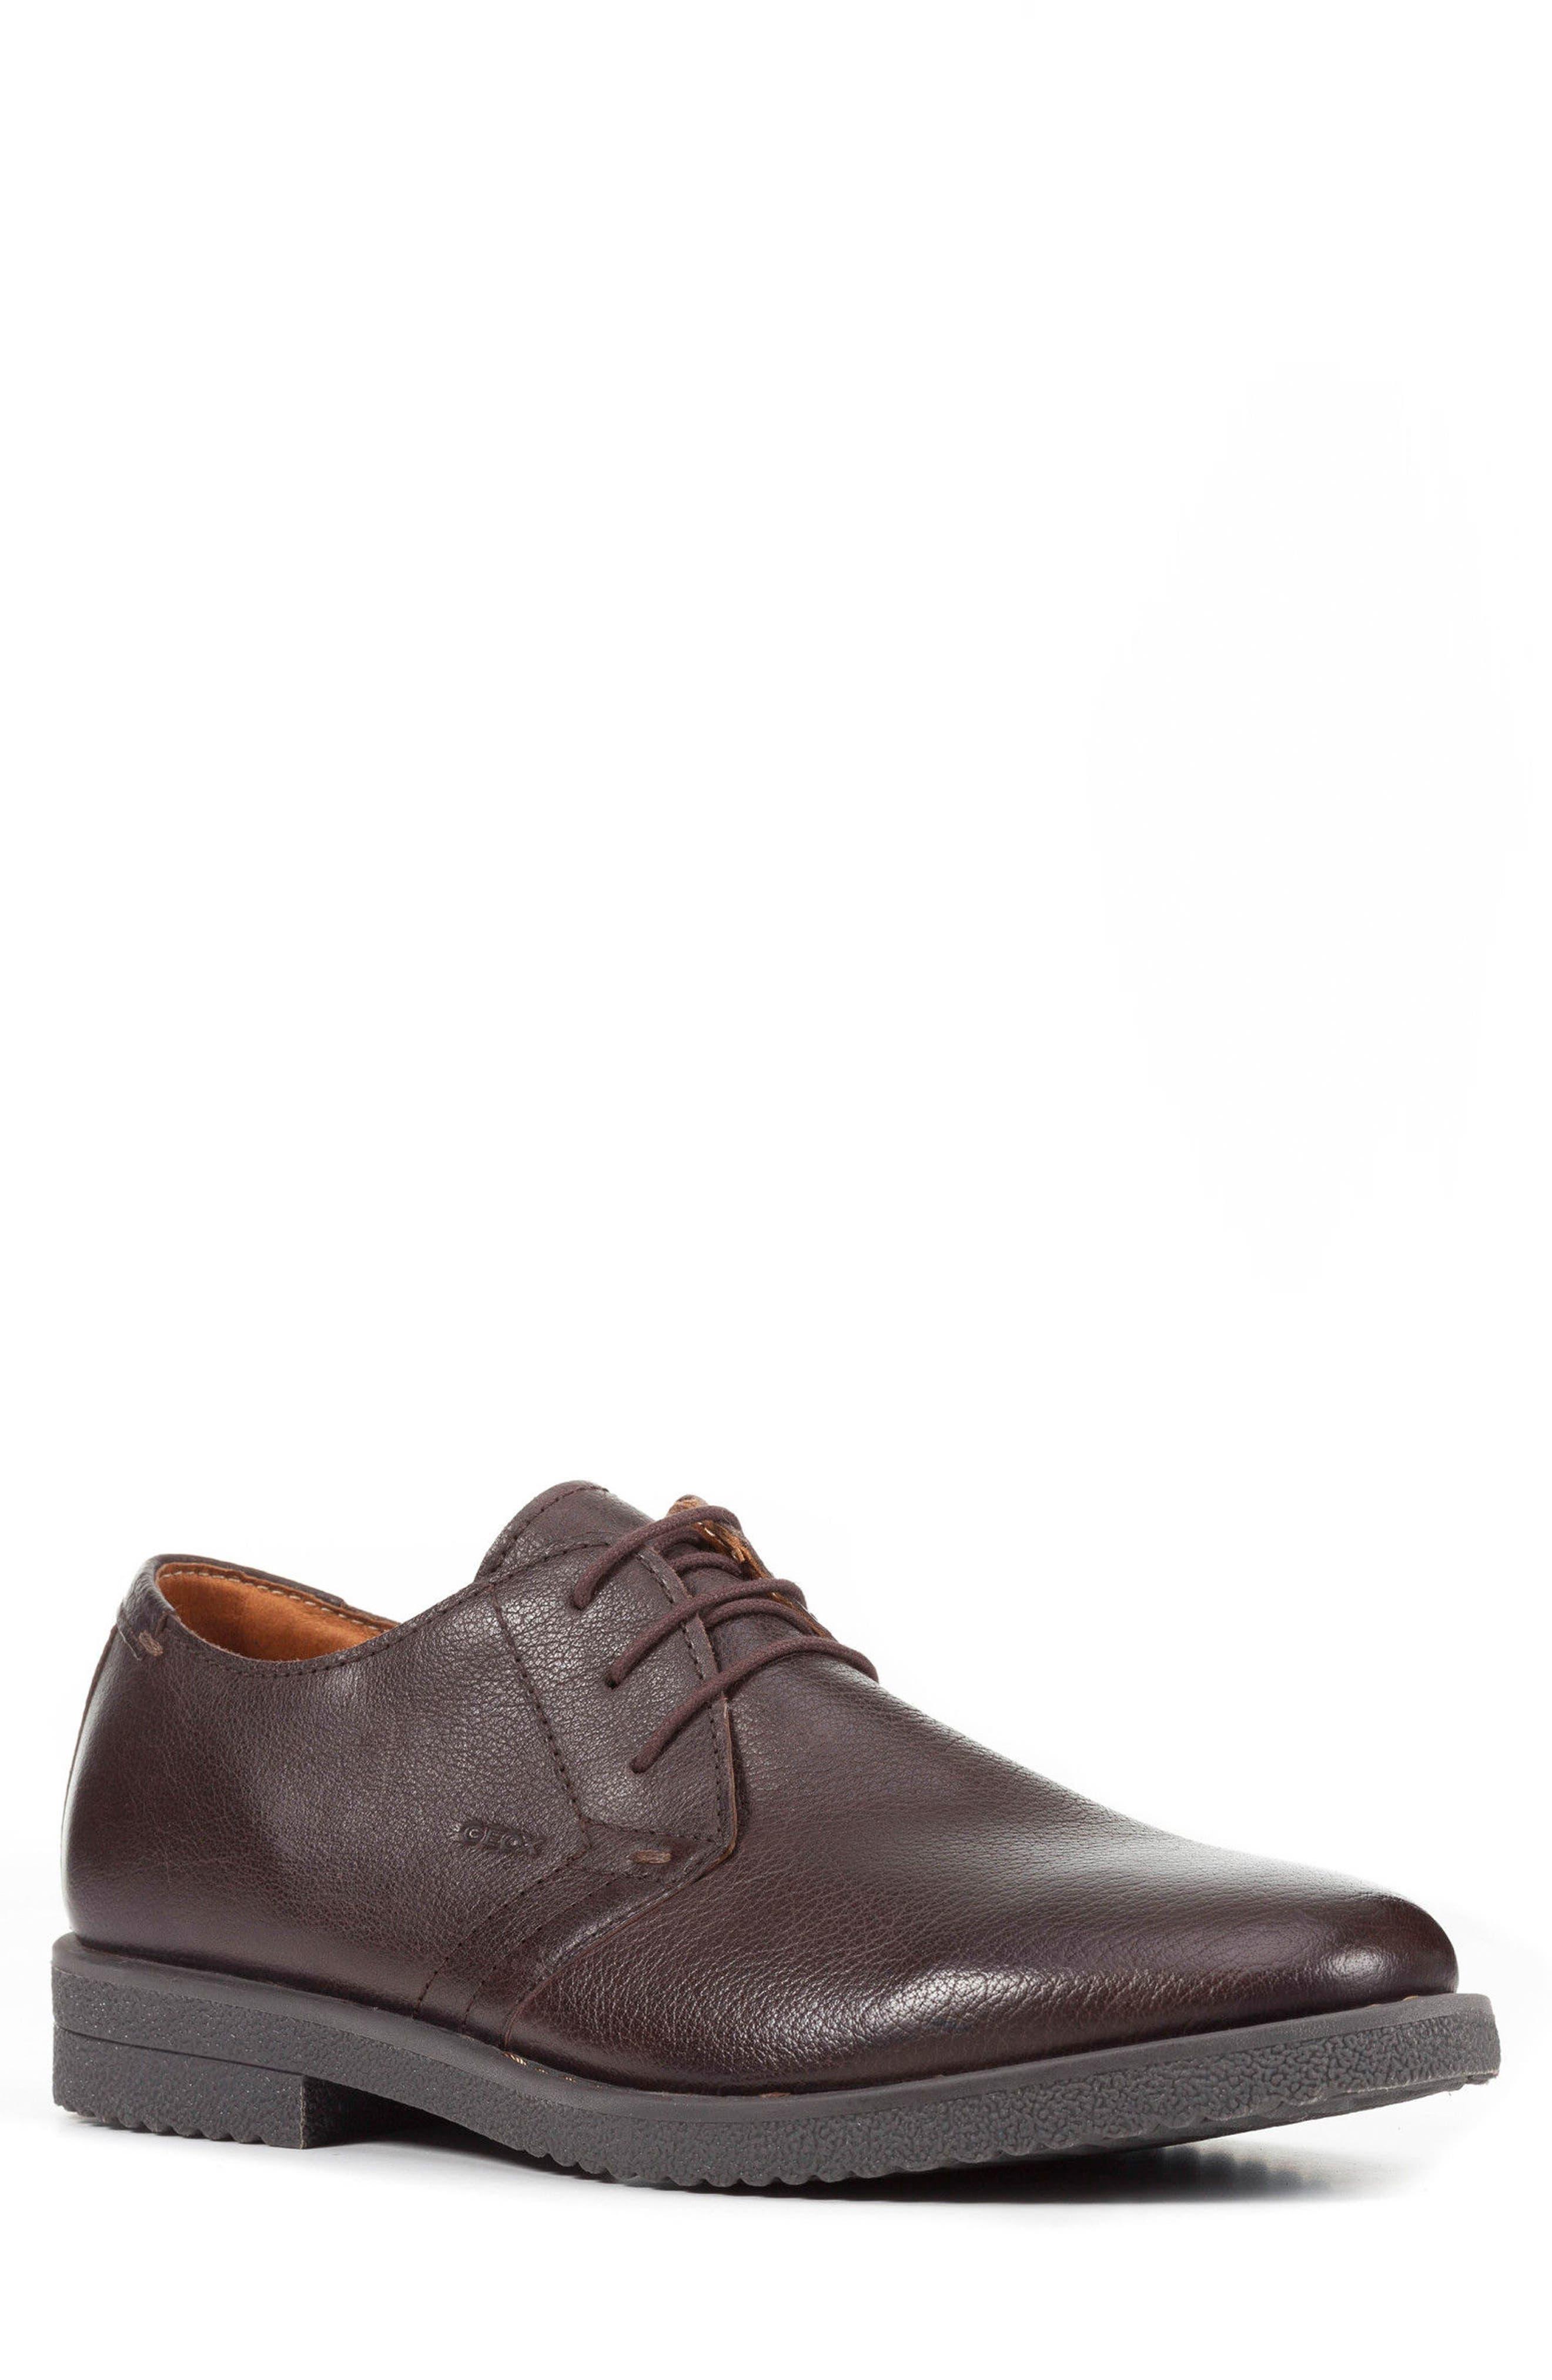 Alternate Image 1 Selected - Geox Brandled Plain Toe Derby (Men)